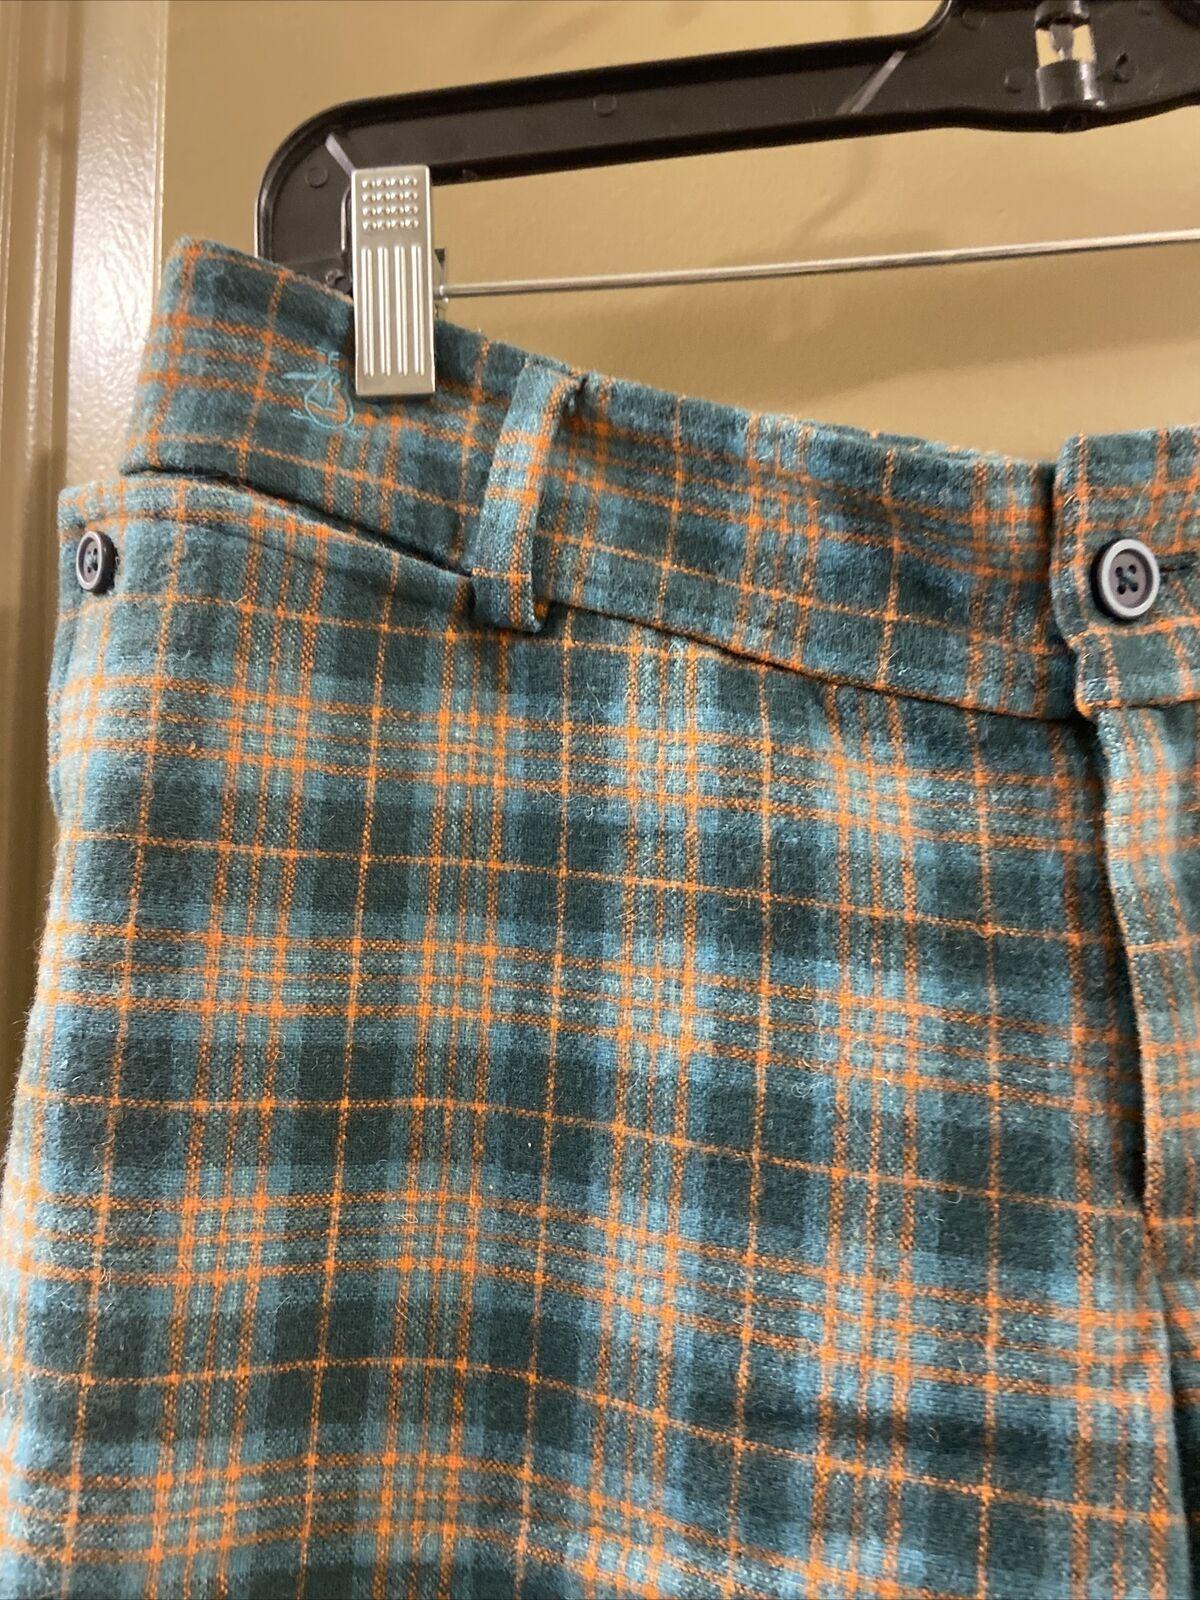 Penguin Wool Green Plaid Pants Sz 0 (item 9.8) - image 2